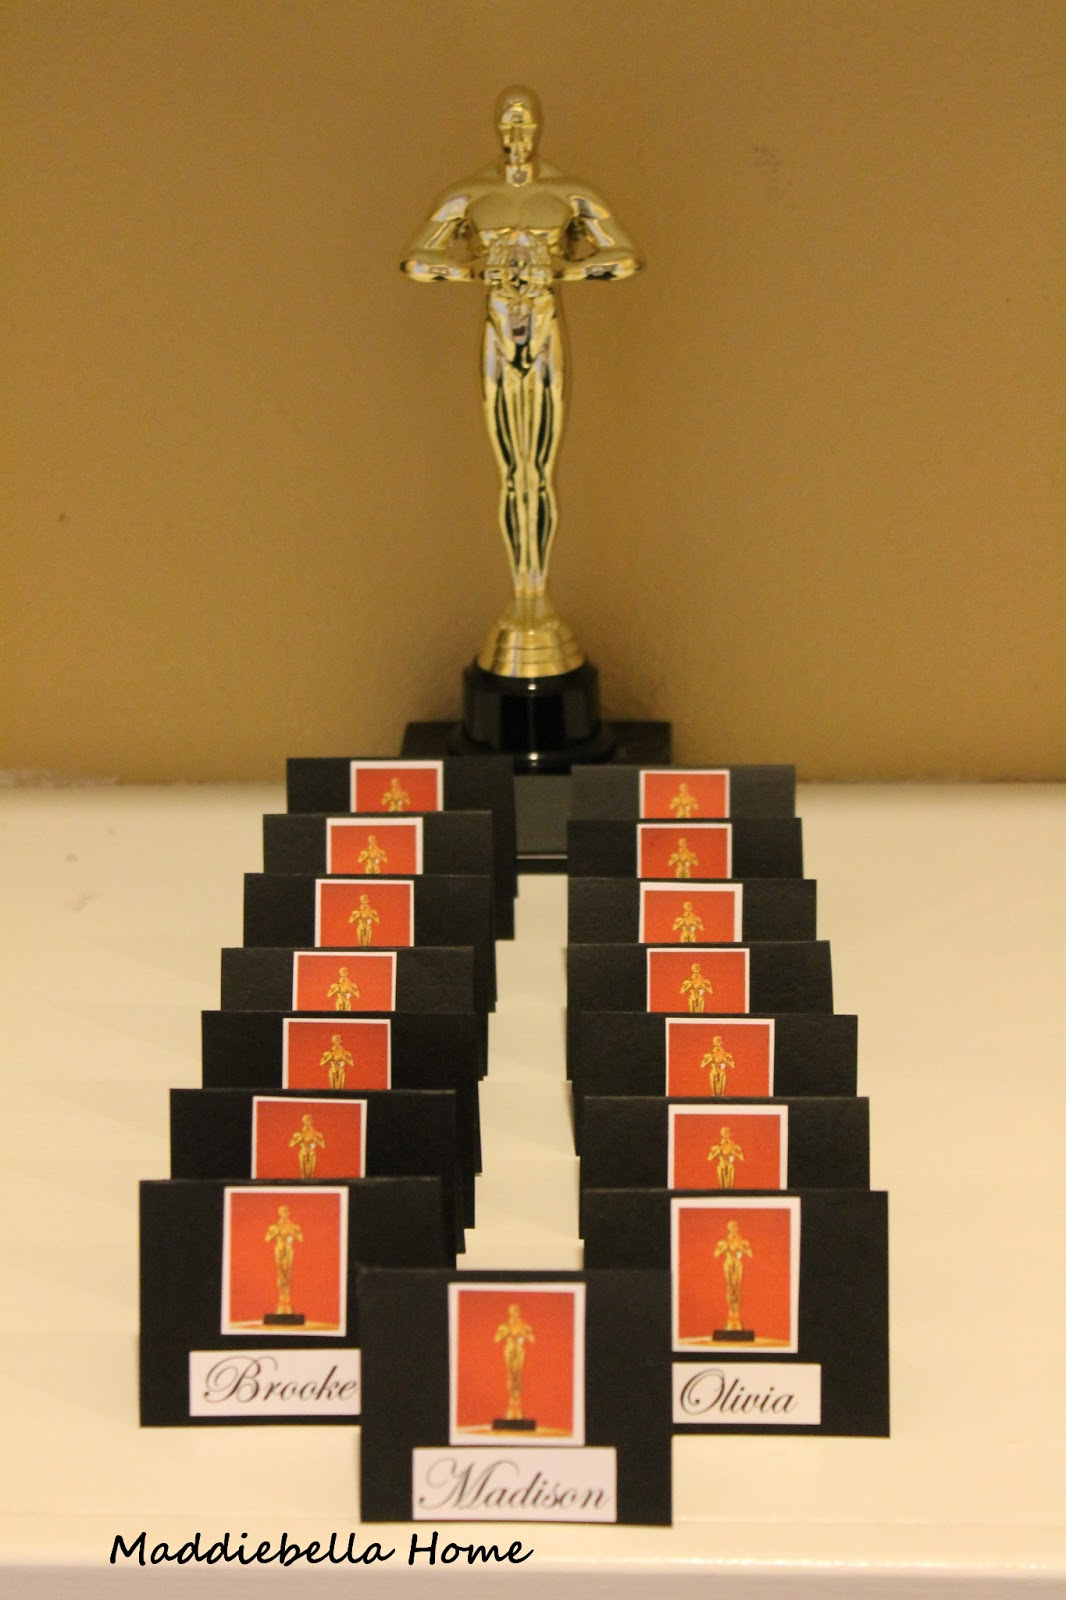 Grammy Awards Red Carpet Pictures Images Hollywood Oscar